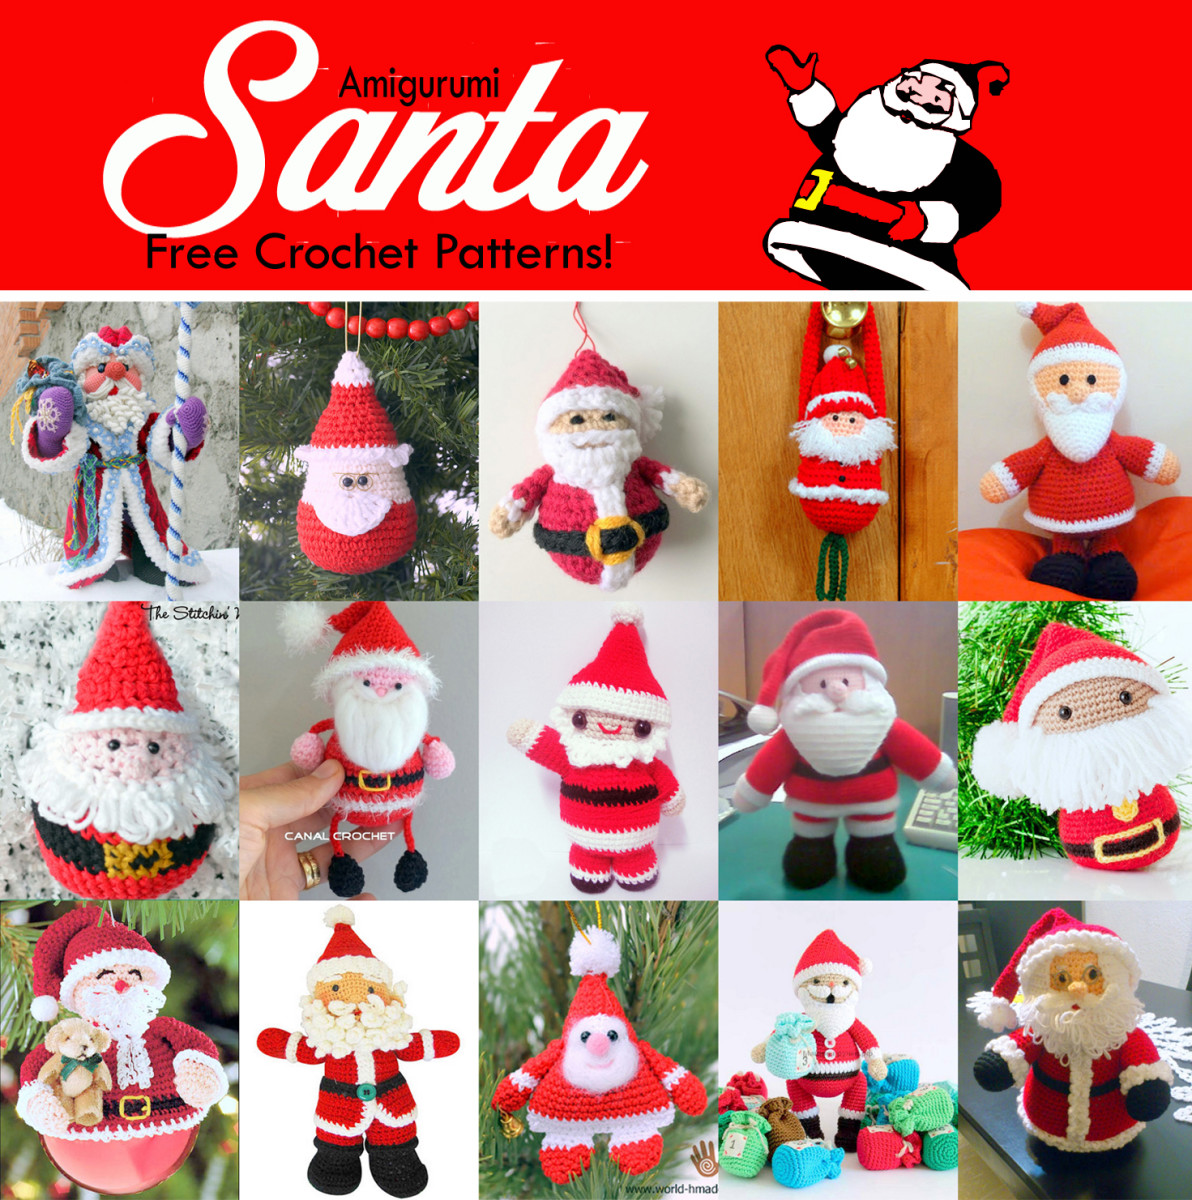 19 Free Amigurumi Christmas Santa Crochet Patterns | HubPages